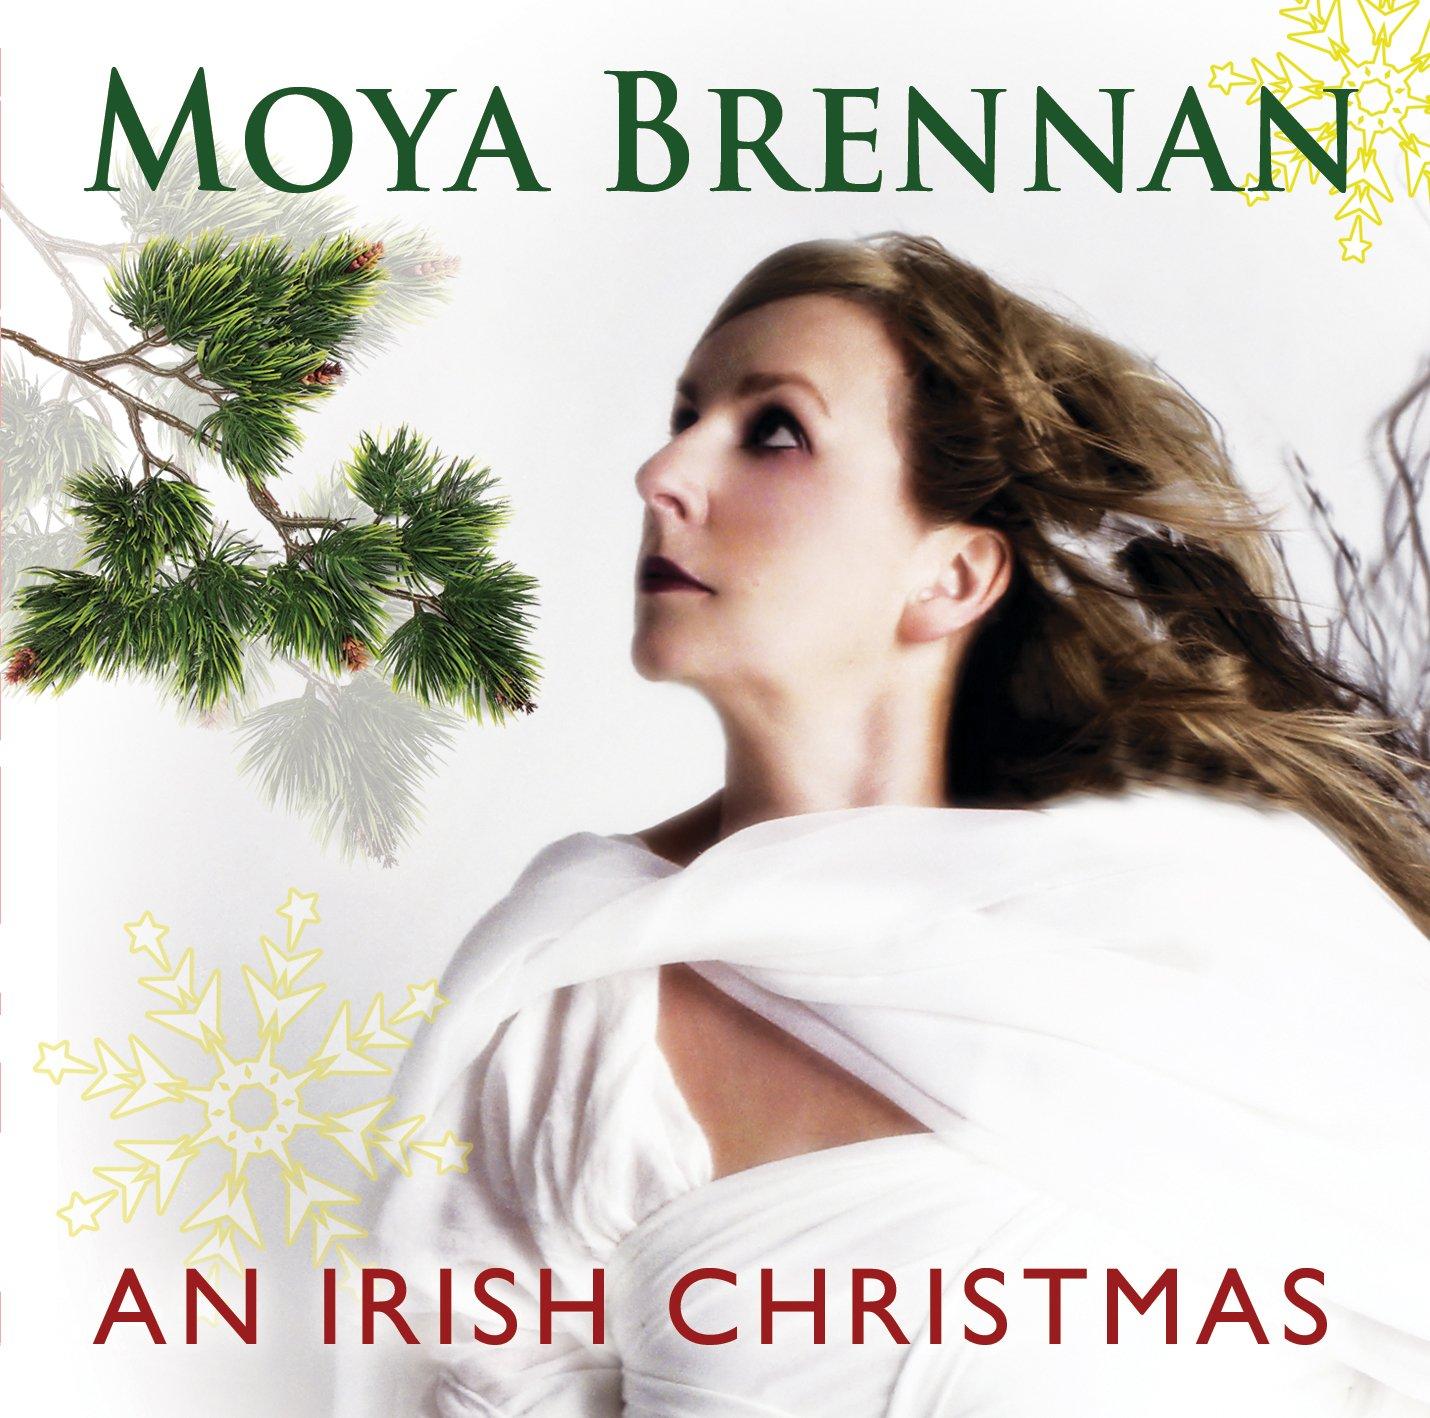 Moya Brennan - An Irish Christmas [2013 Edition] - Amazon.com Music